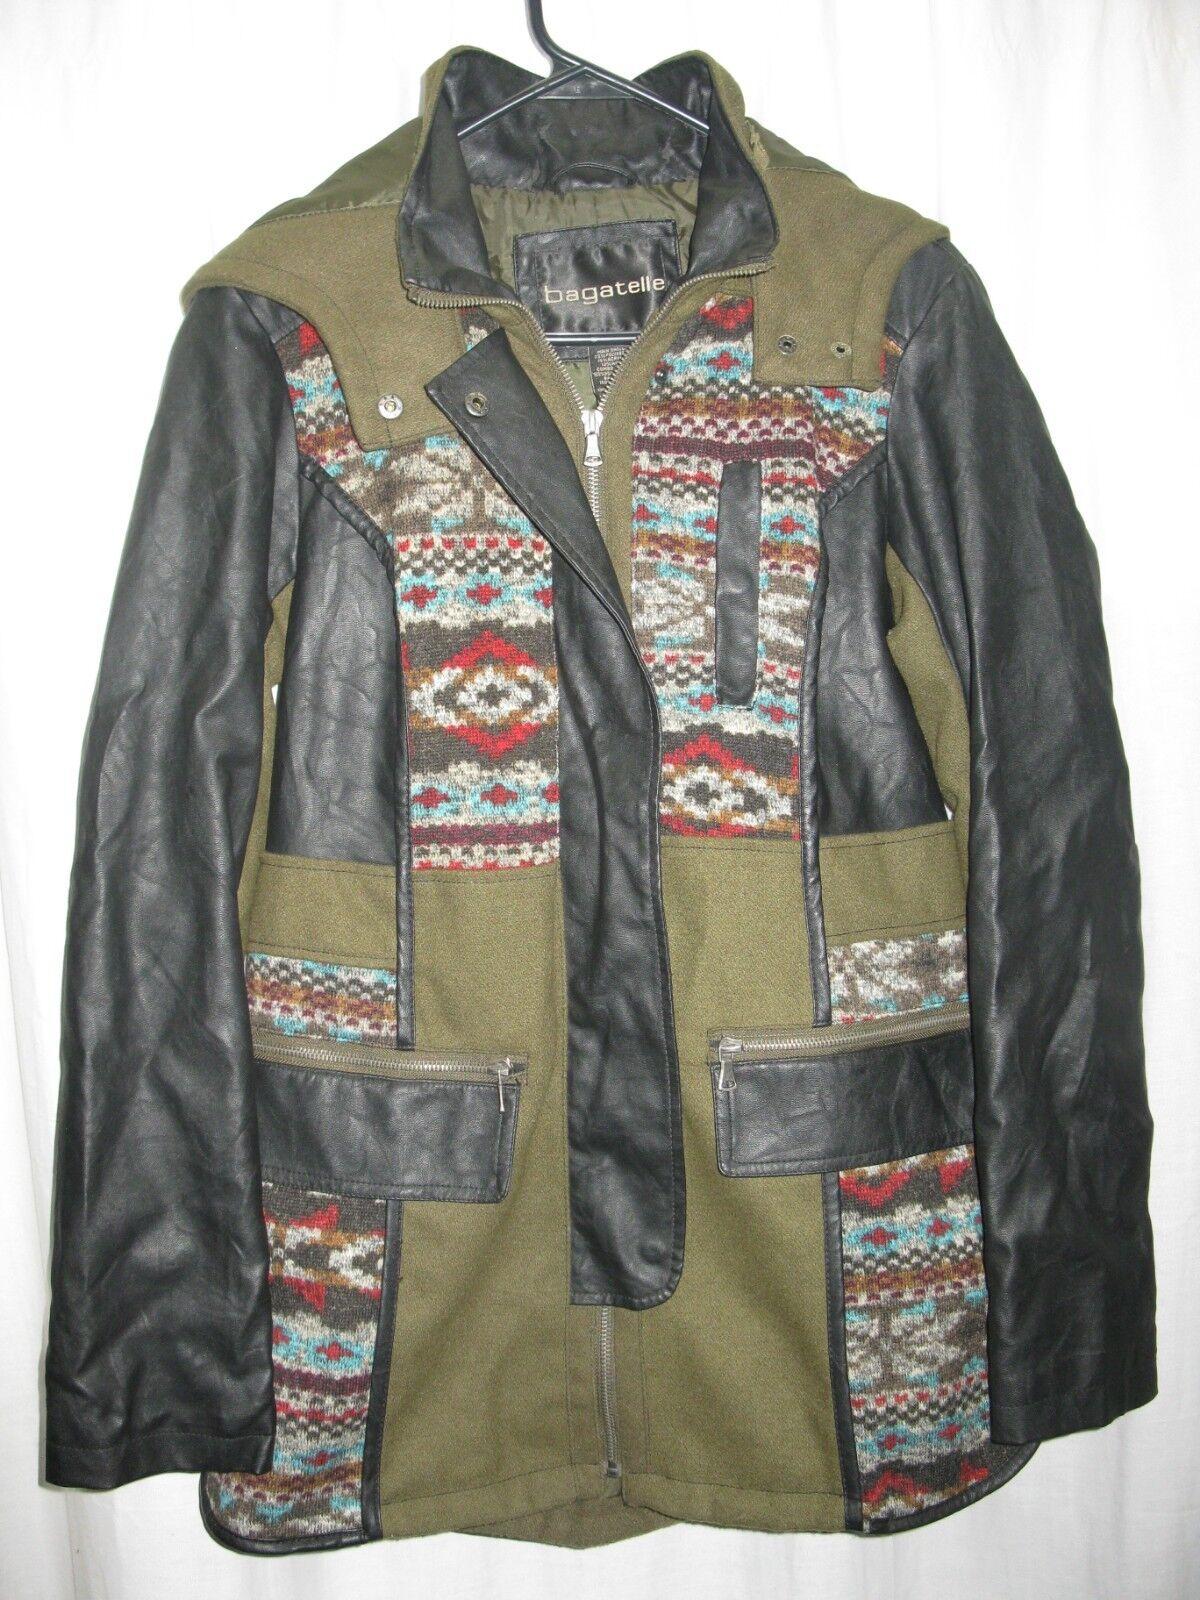 Bagatelle Womens Native Aztec Hooded Faux Leather Jacket Coat Size Medium wool